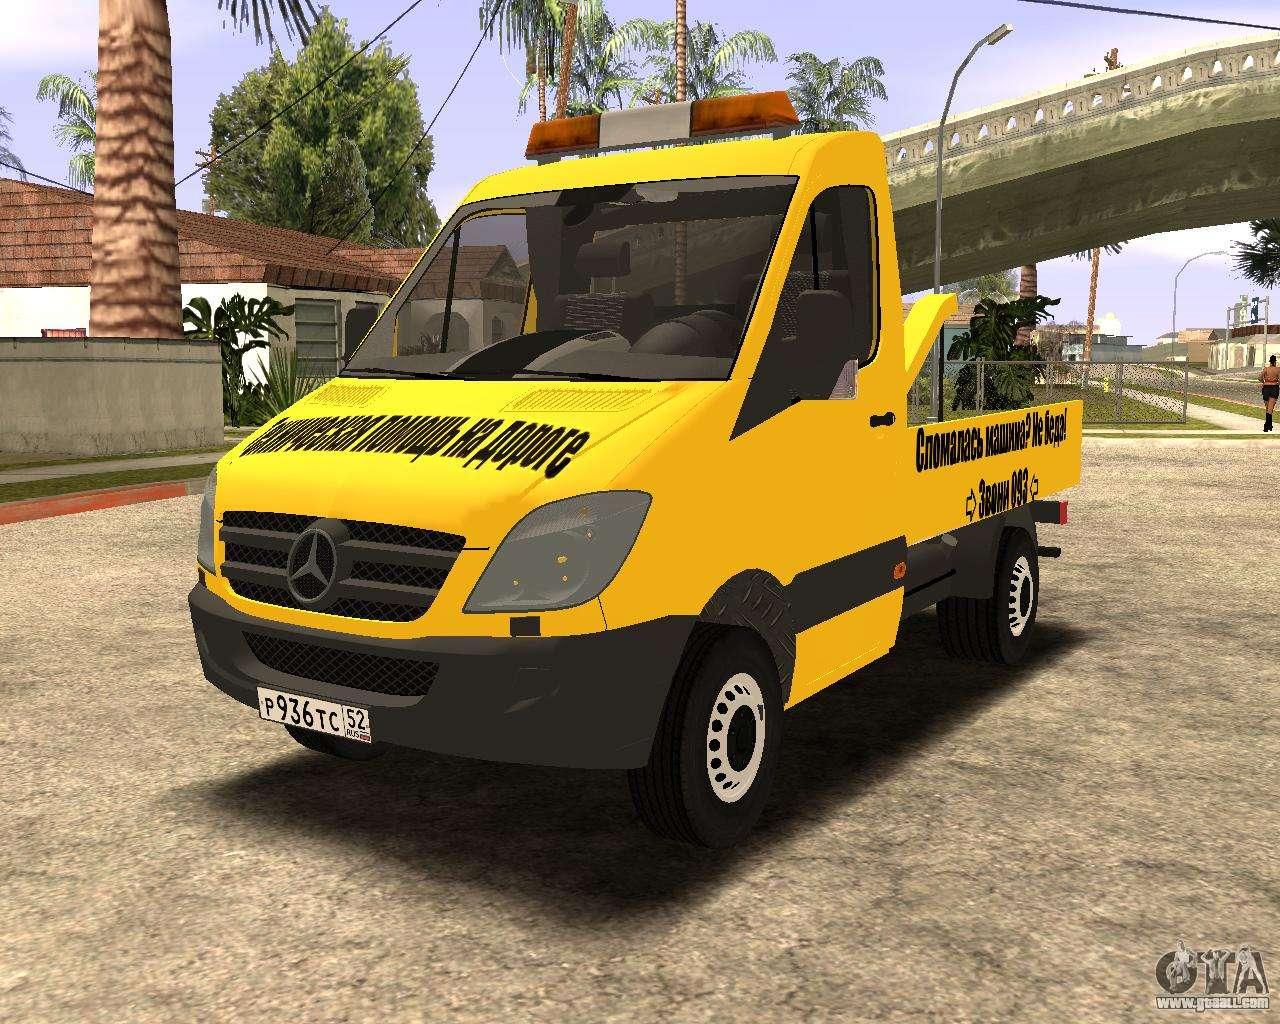 Truck Painting Jobs In Gta